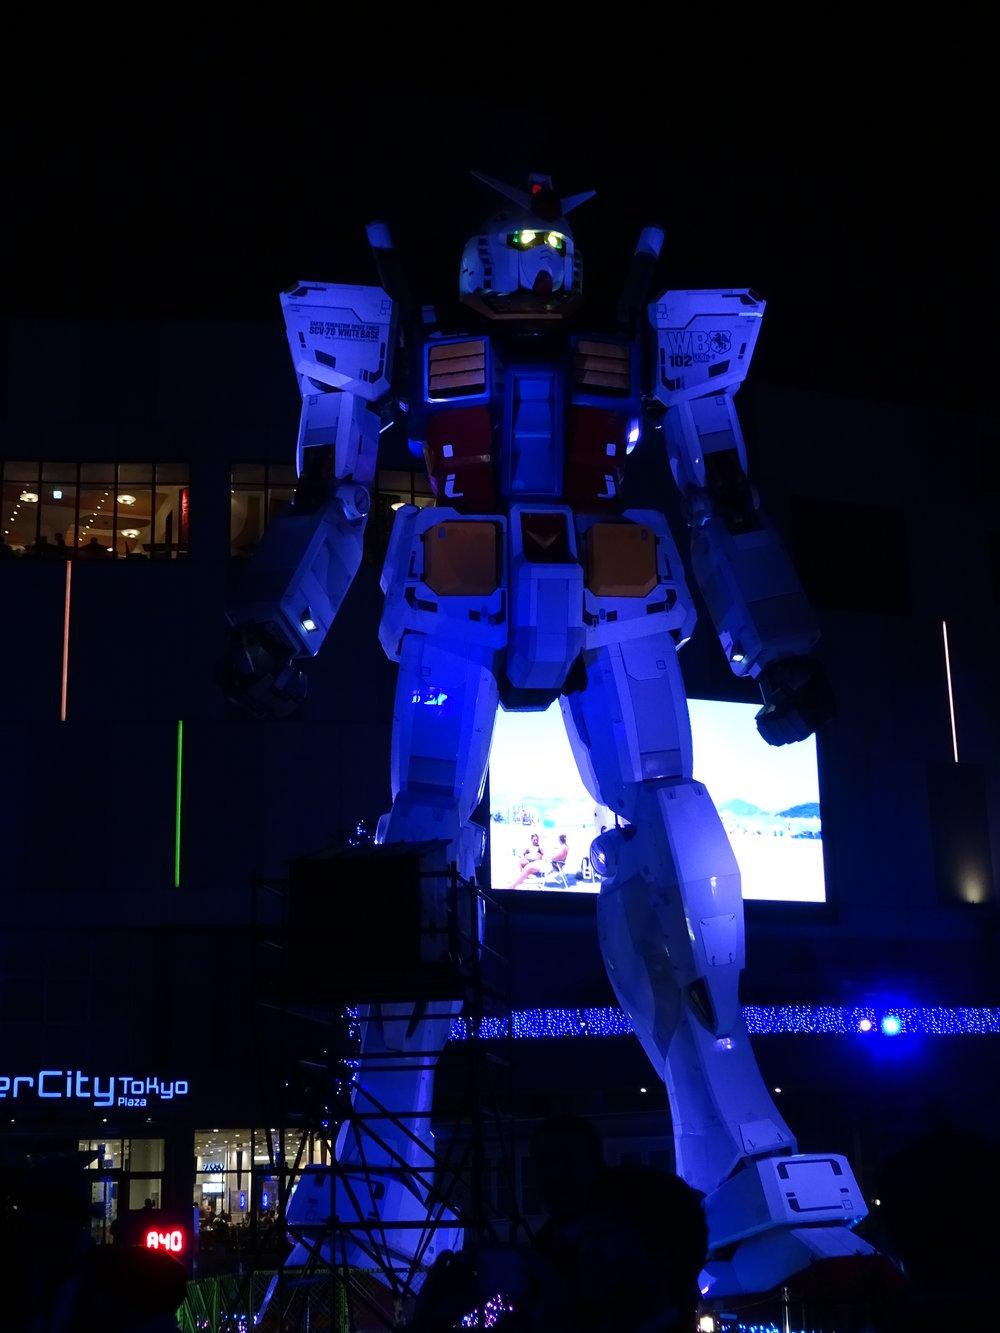 RX-78-2 Gundam 1-1 Statue - 076.jpg